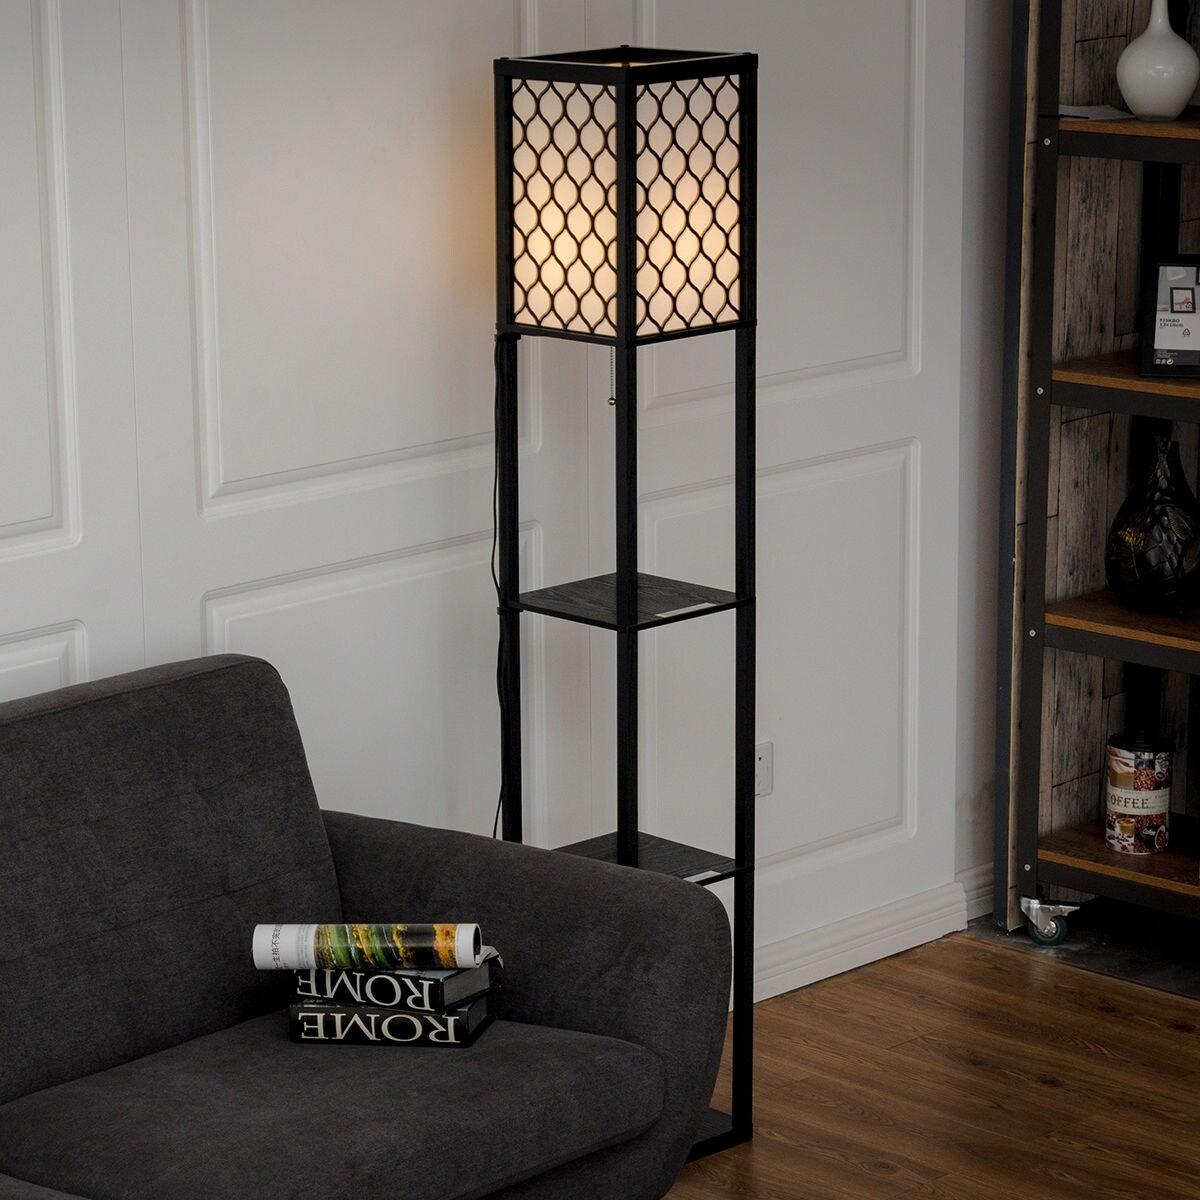 Shop Costway 63u0027u0027 Modern Shelf Floor Lamp Lighting Home Living Room W/ 3  Storage Shelves   As Pic   Free Shipping Today   Overstock.com   18298249